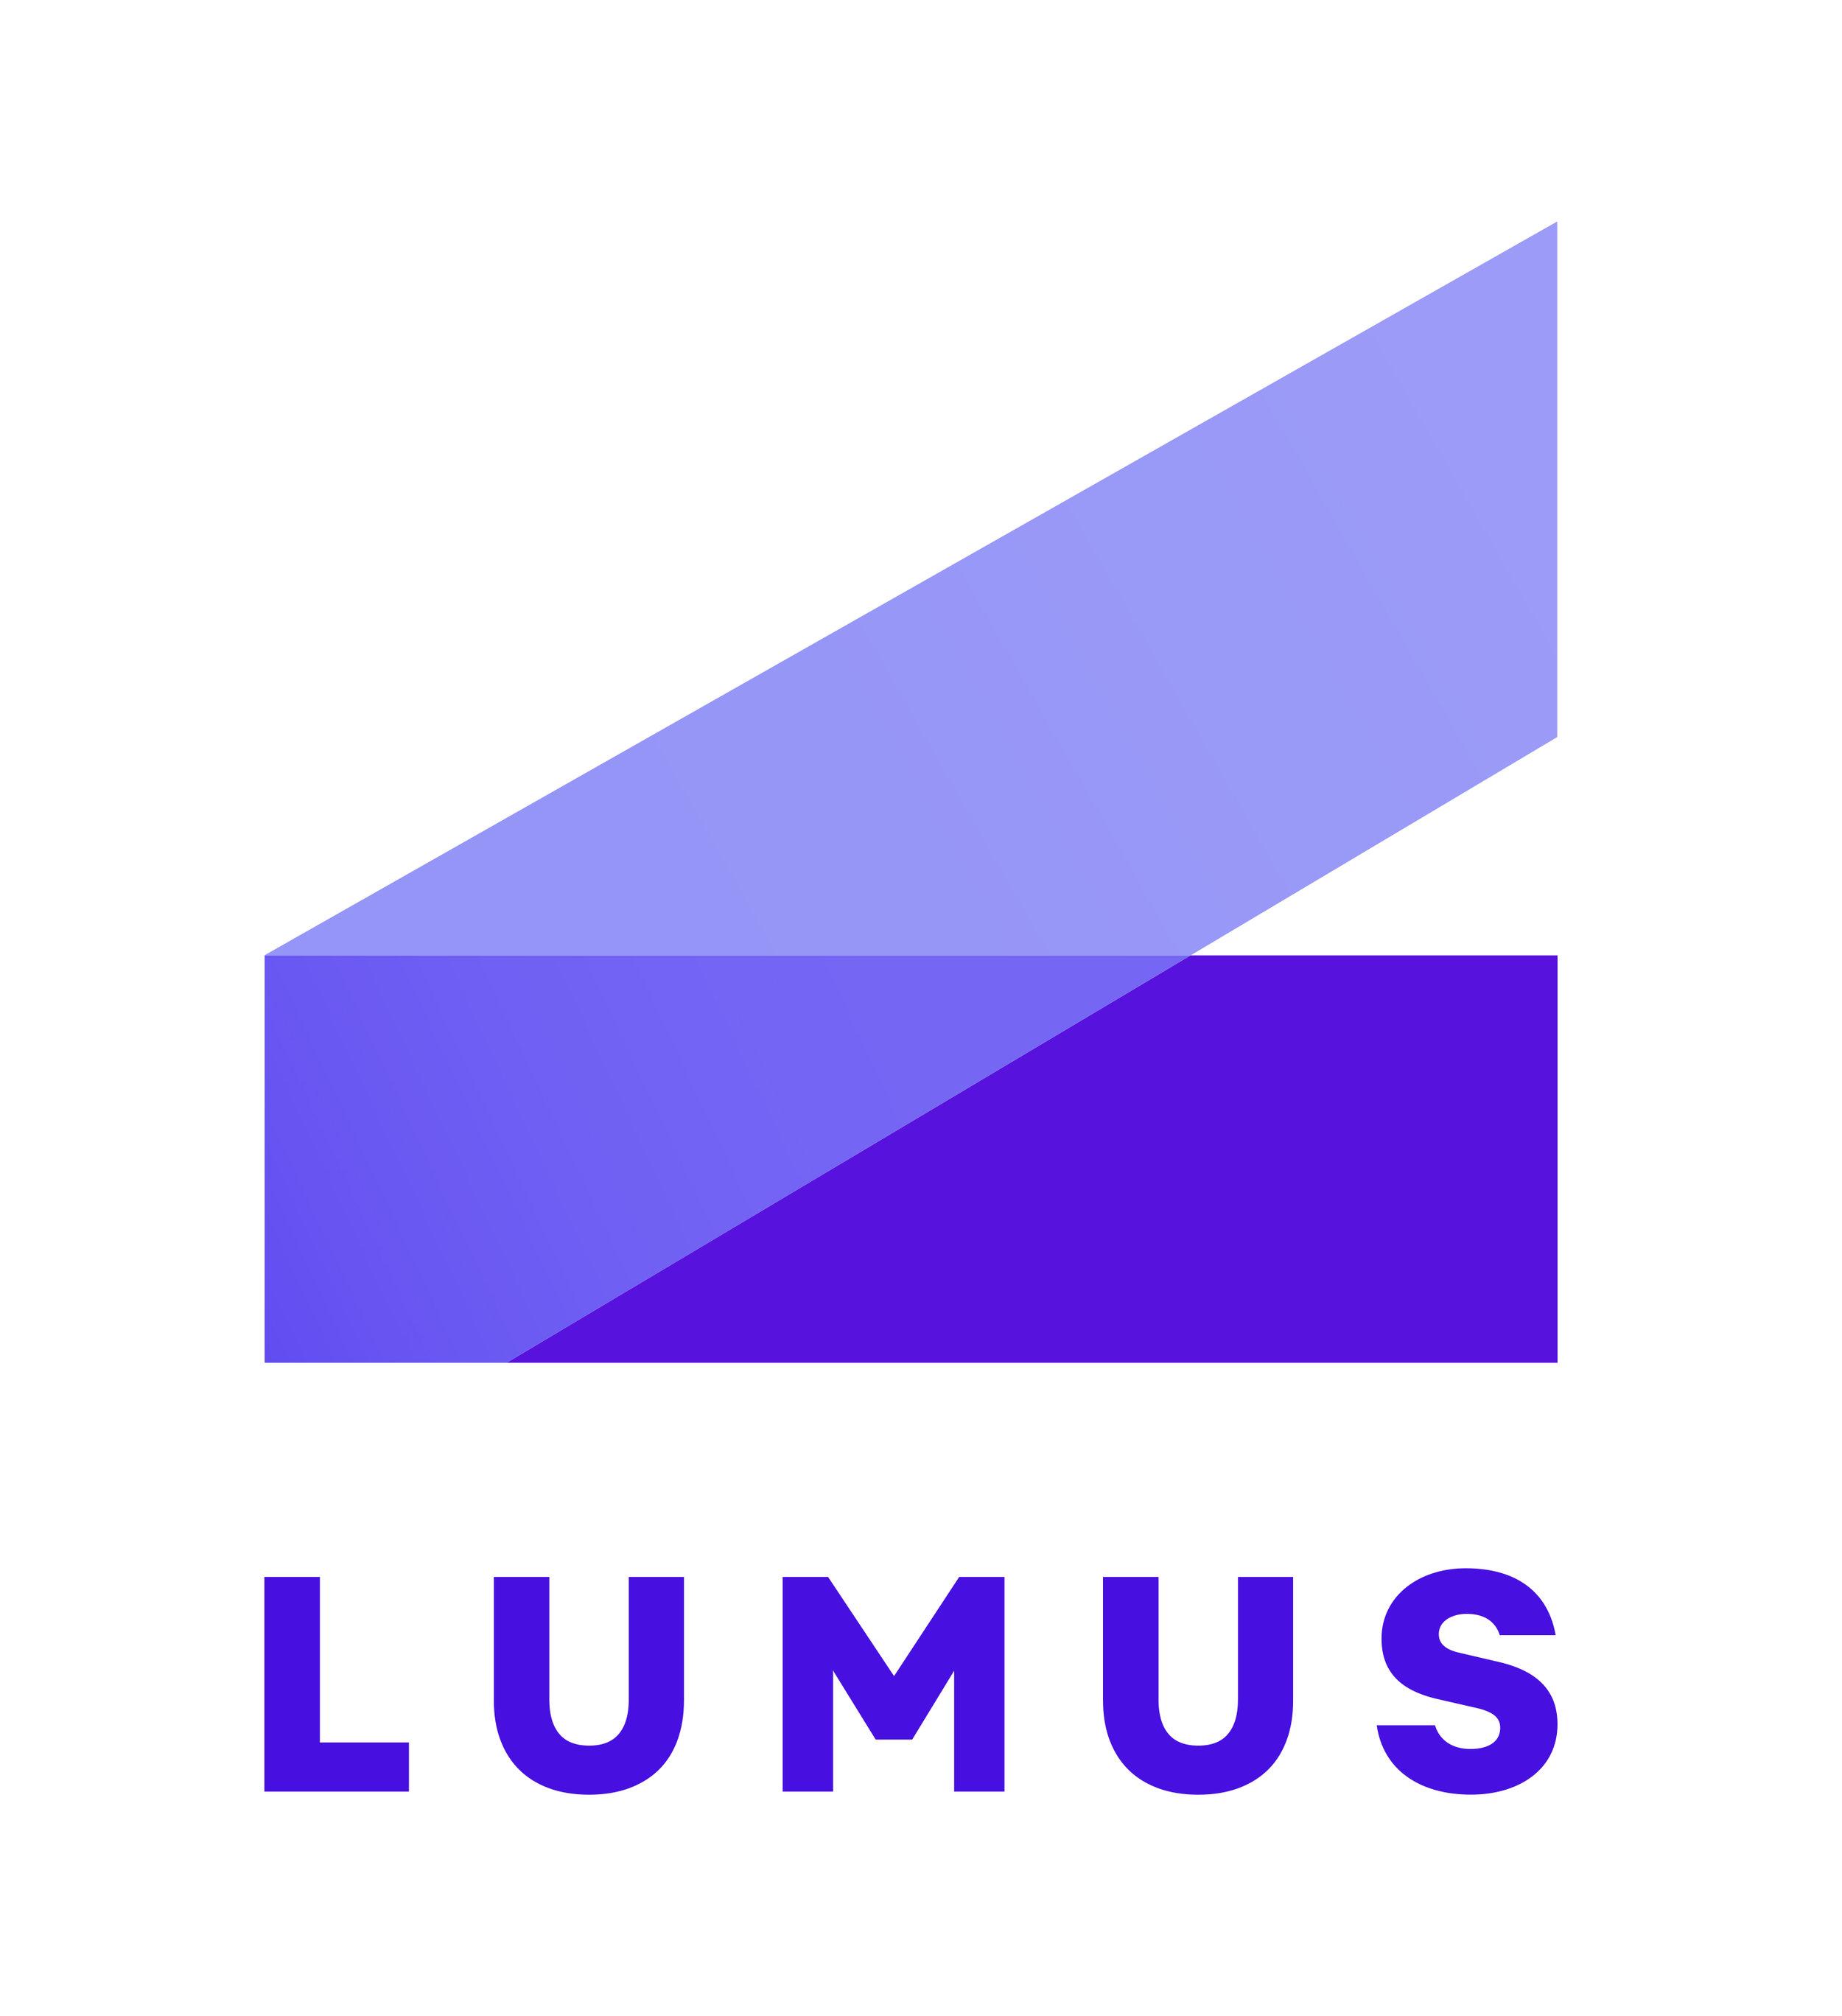 Lumus logo transparent.logo.jpg